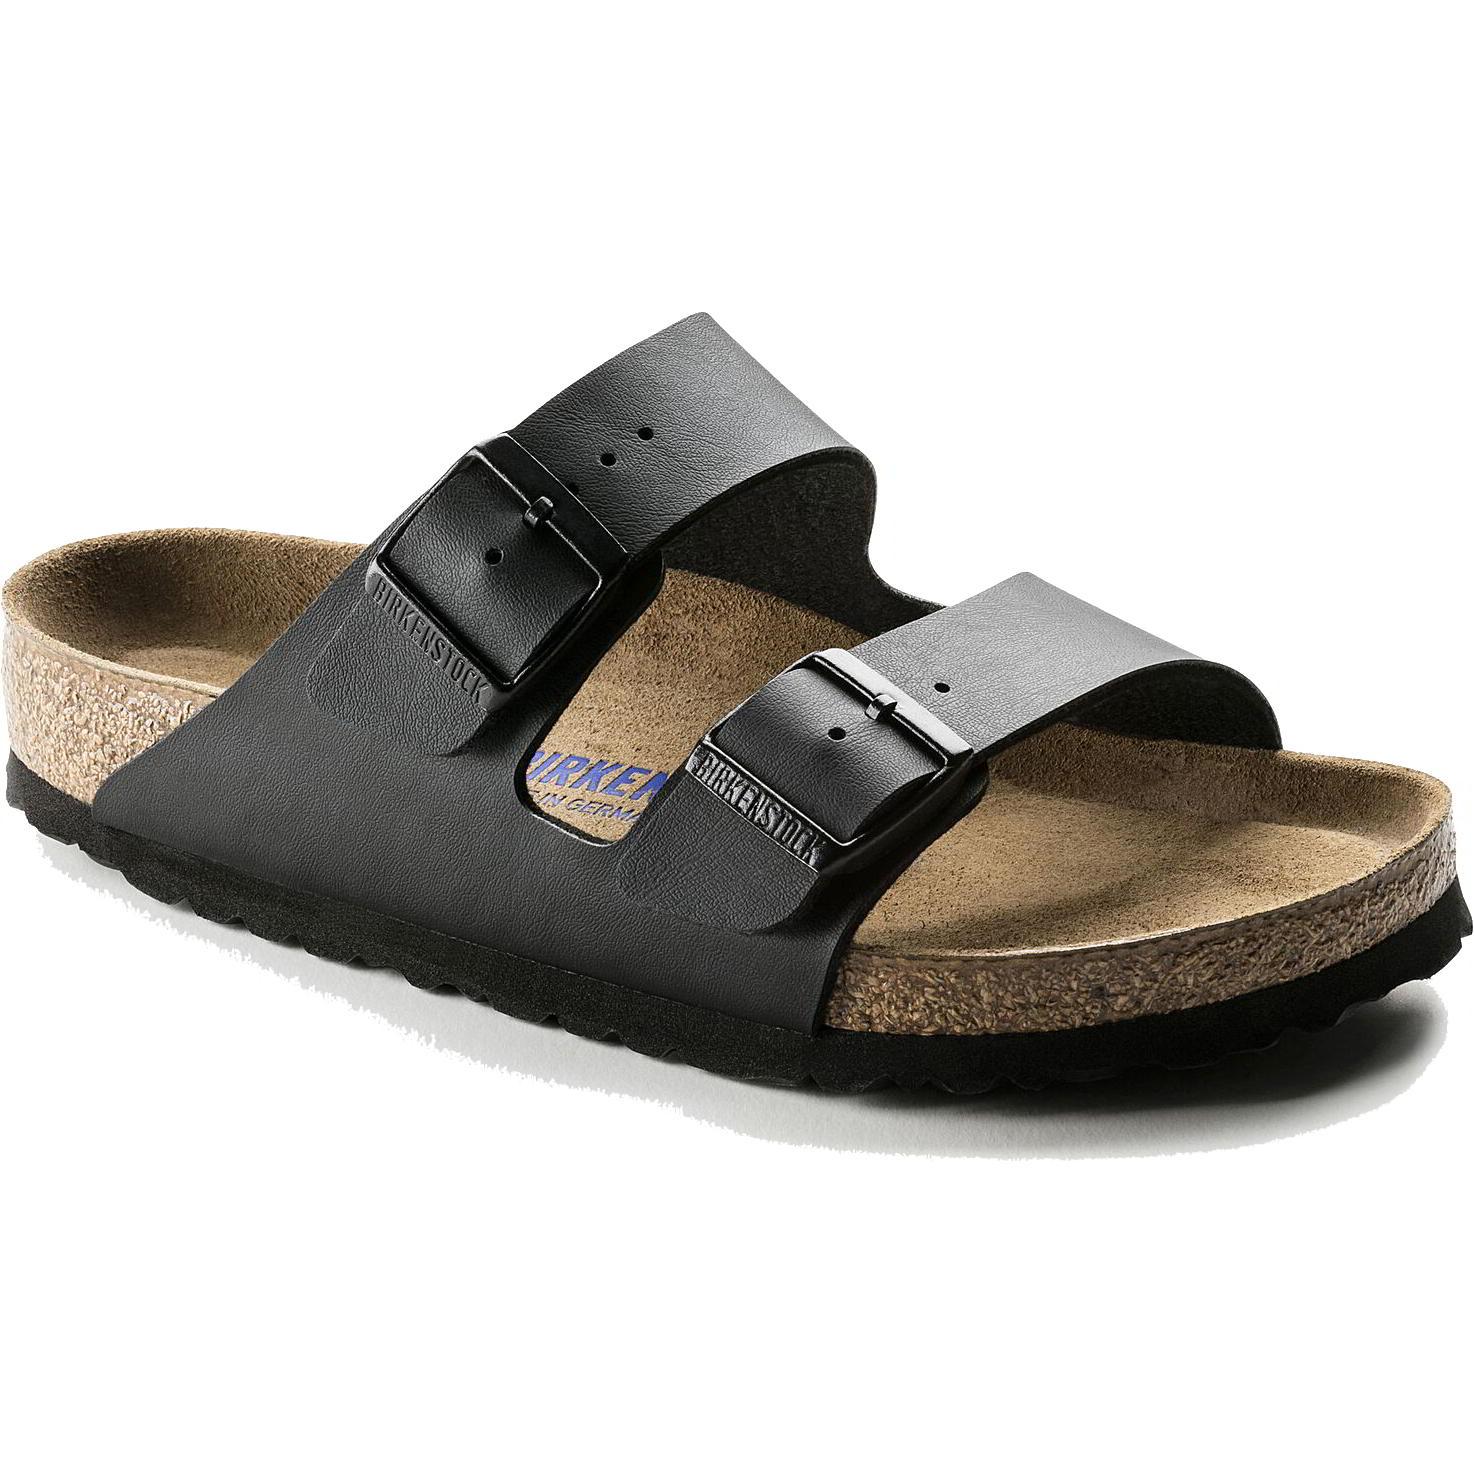 Birkenstock Mens Womens Arizona Soft Footbed BirkoFlor Sandals - Black